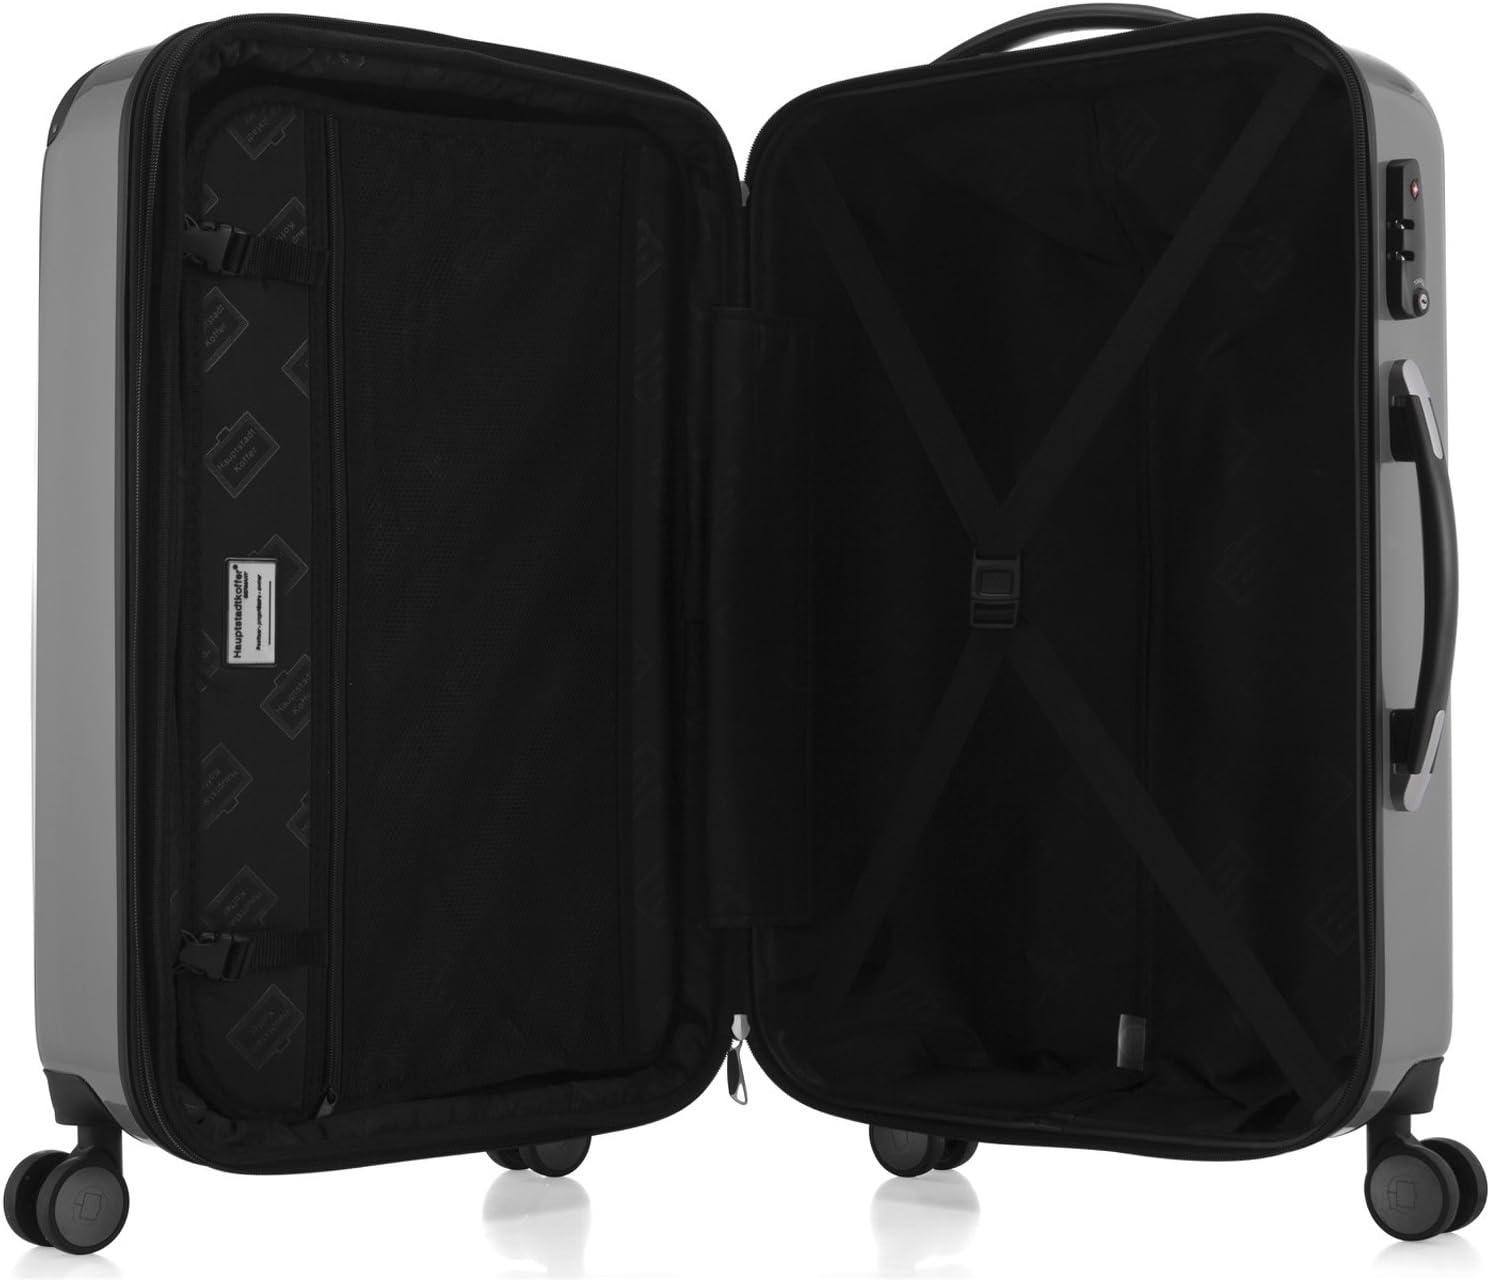 TSA HAUPTSTADTKOFFER Alex Luggages Set Double Wheel Hardside Suitcase Sets Glossy Trolley Expandable Burgundy 2028